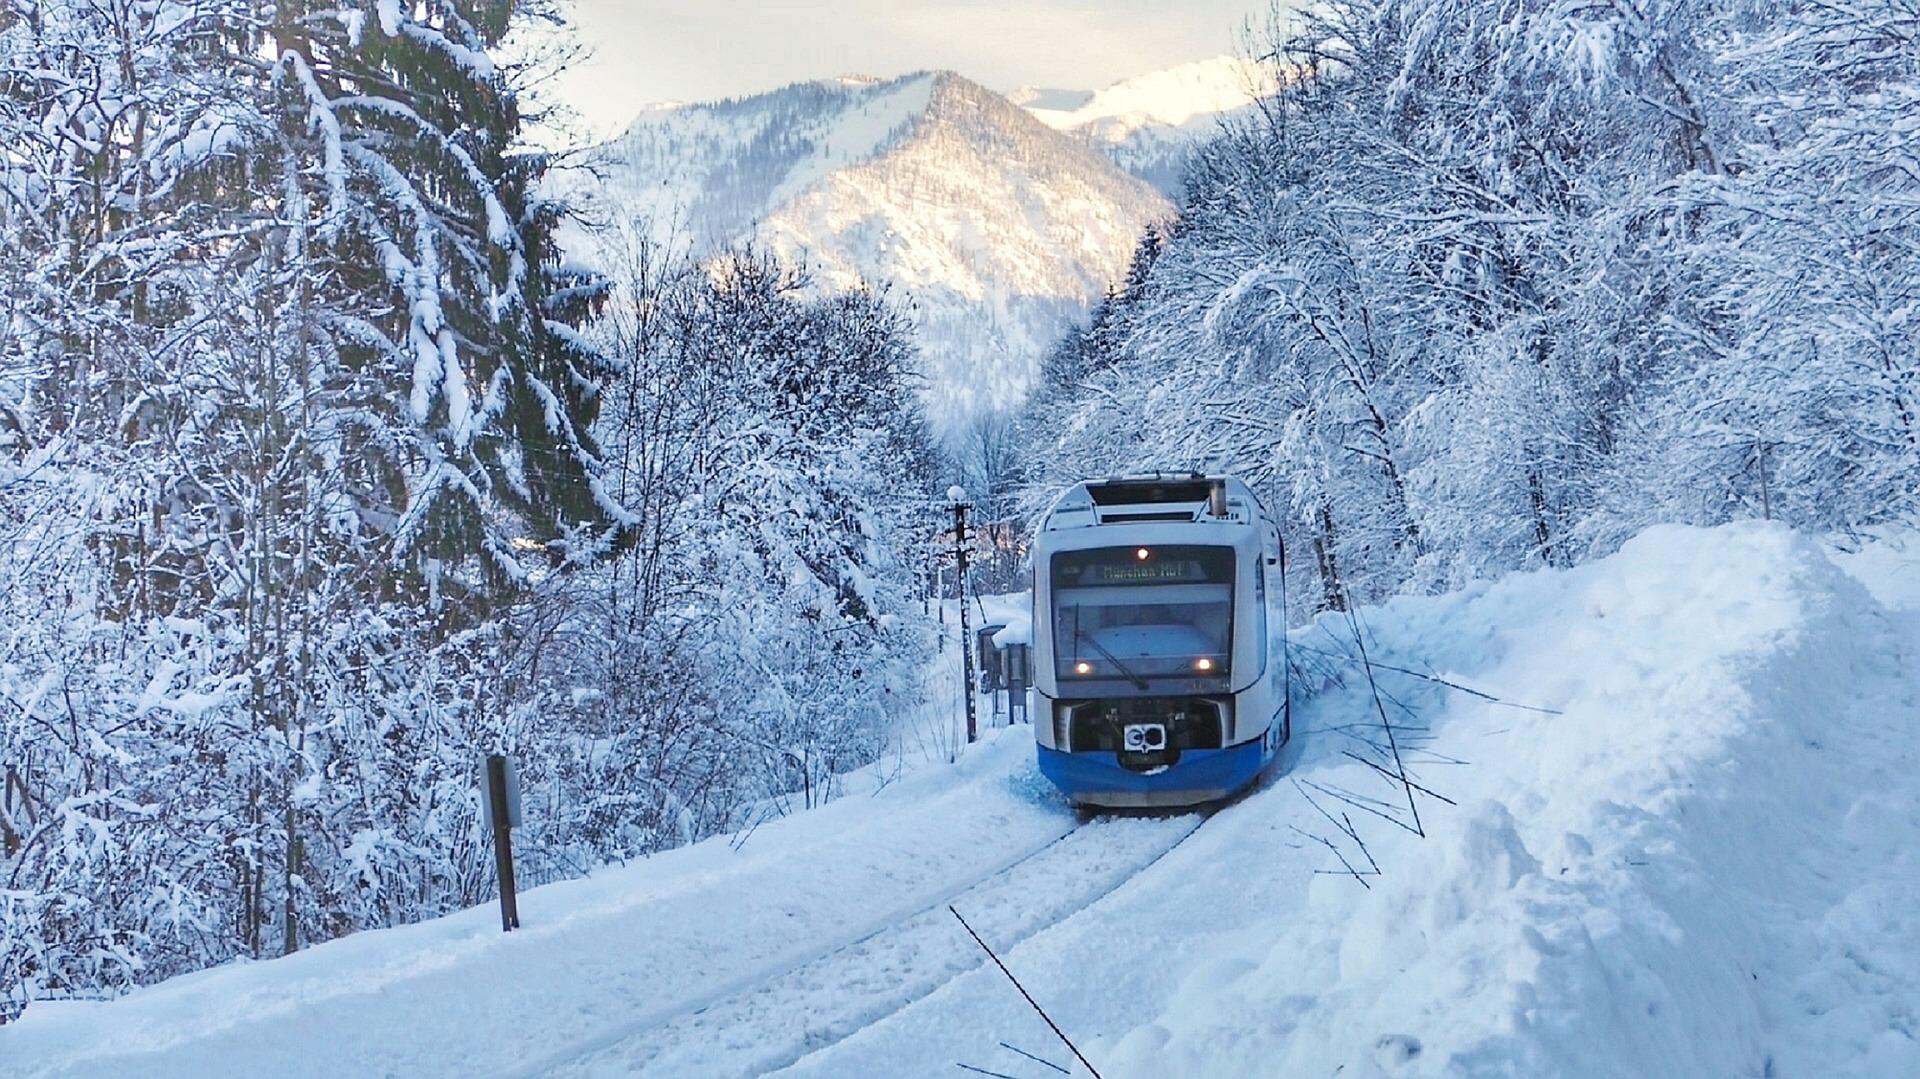 Trein sneeuw wintersportdeluxe